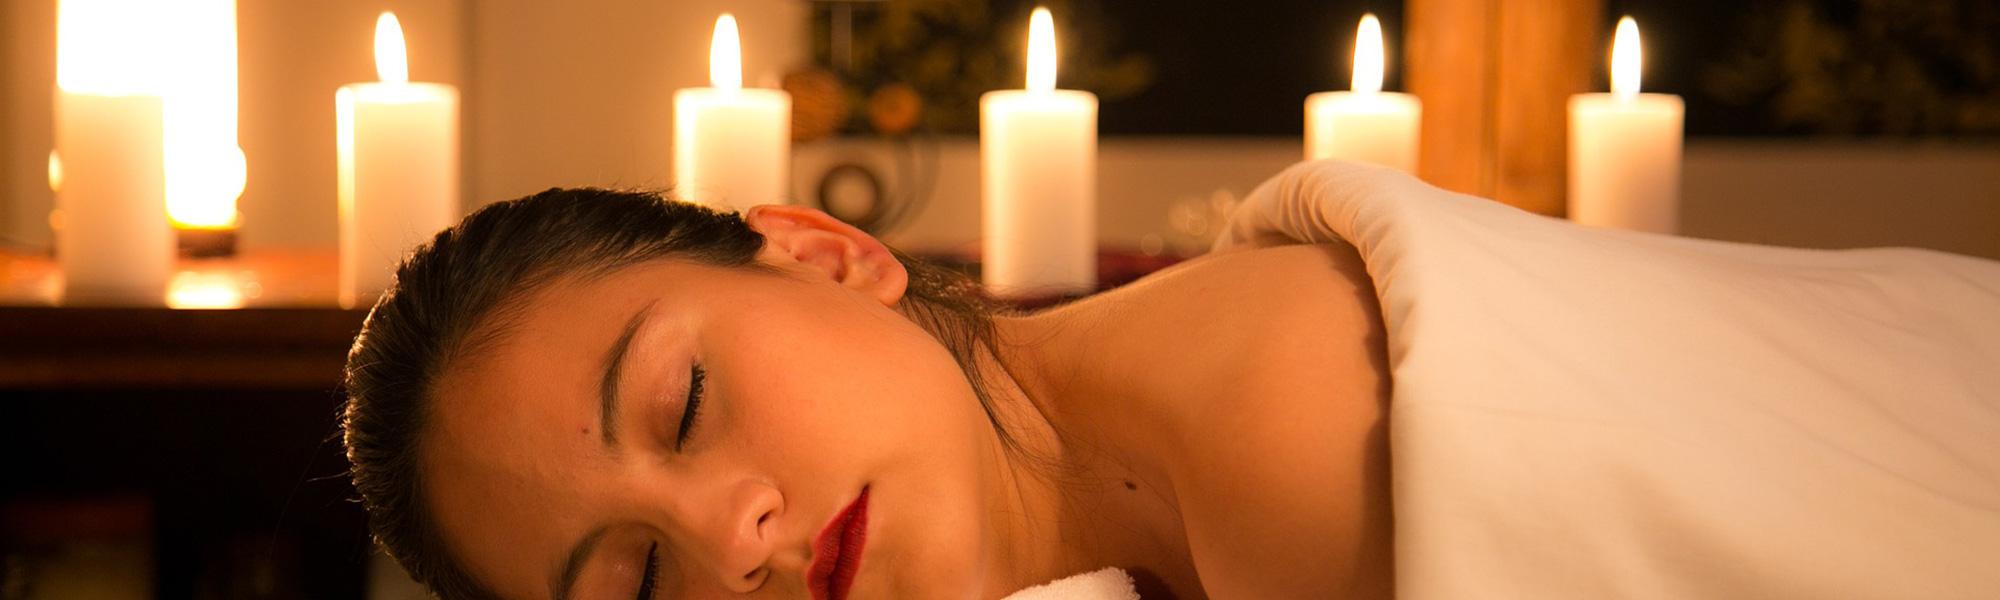 Massage Waltrop